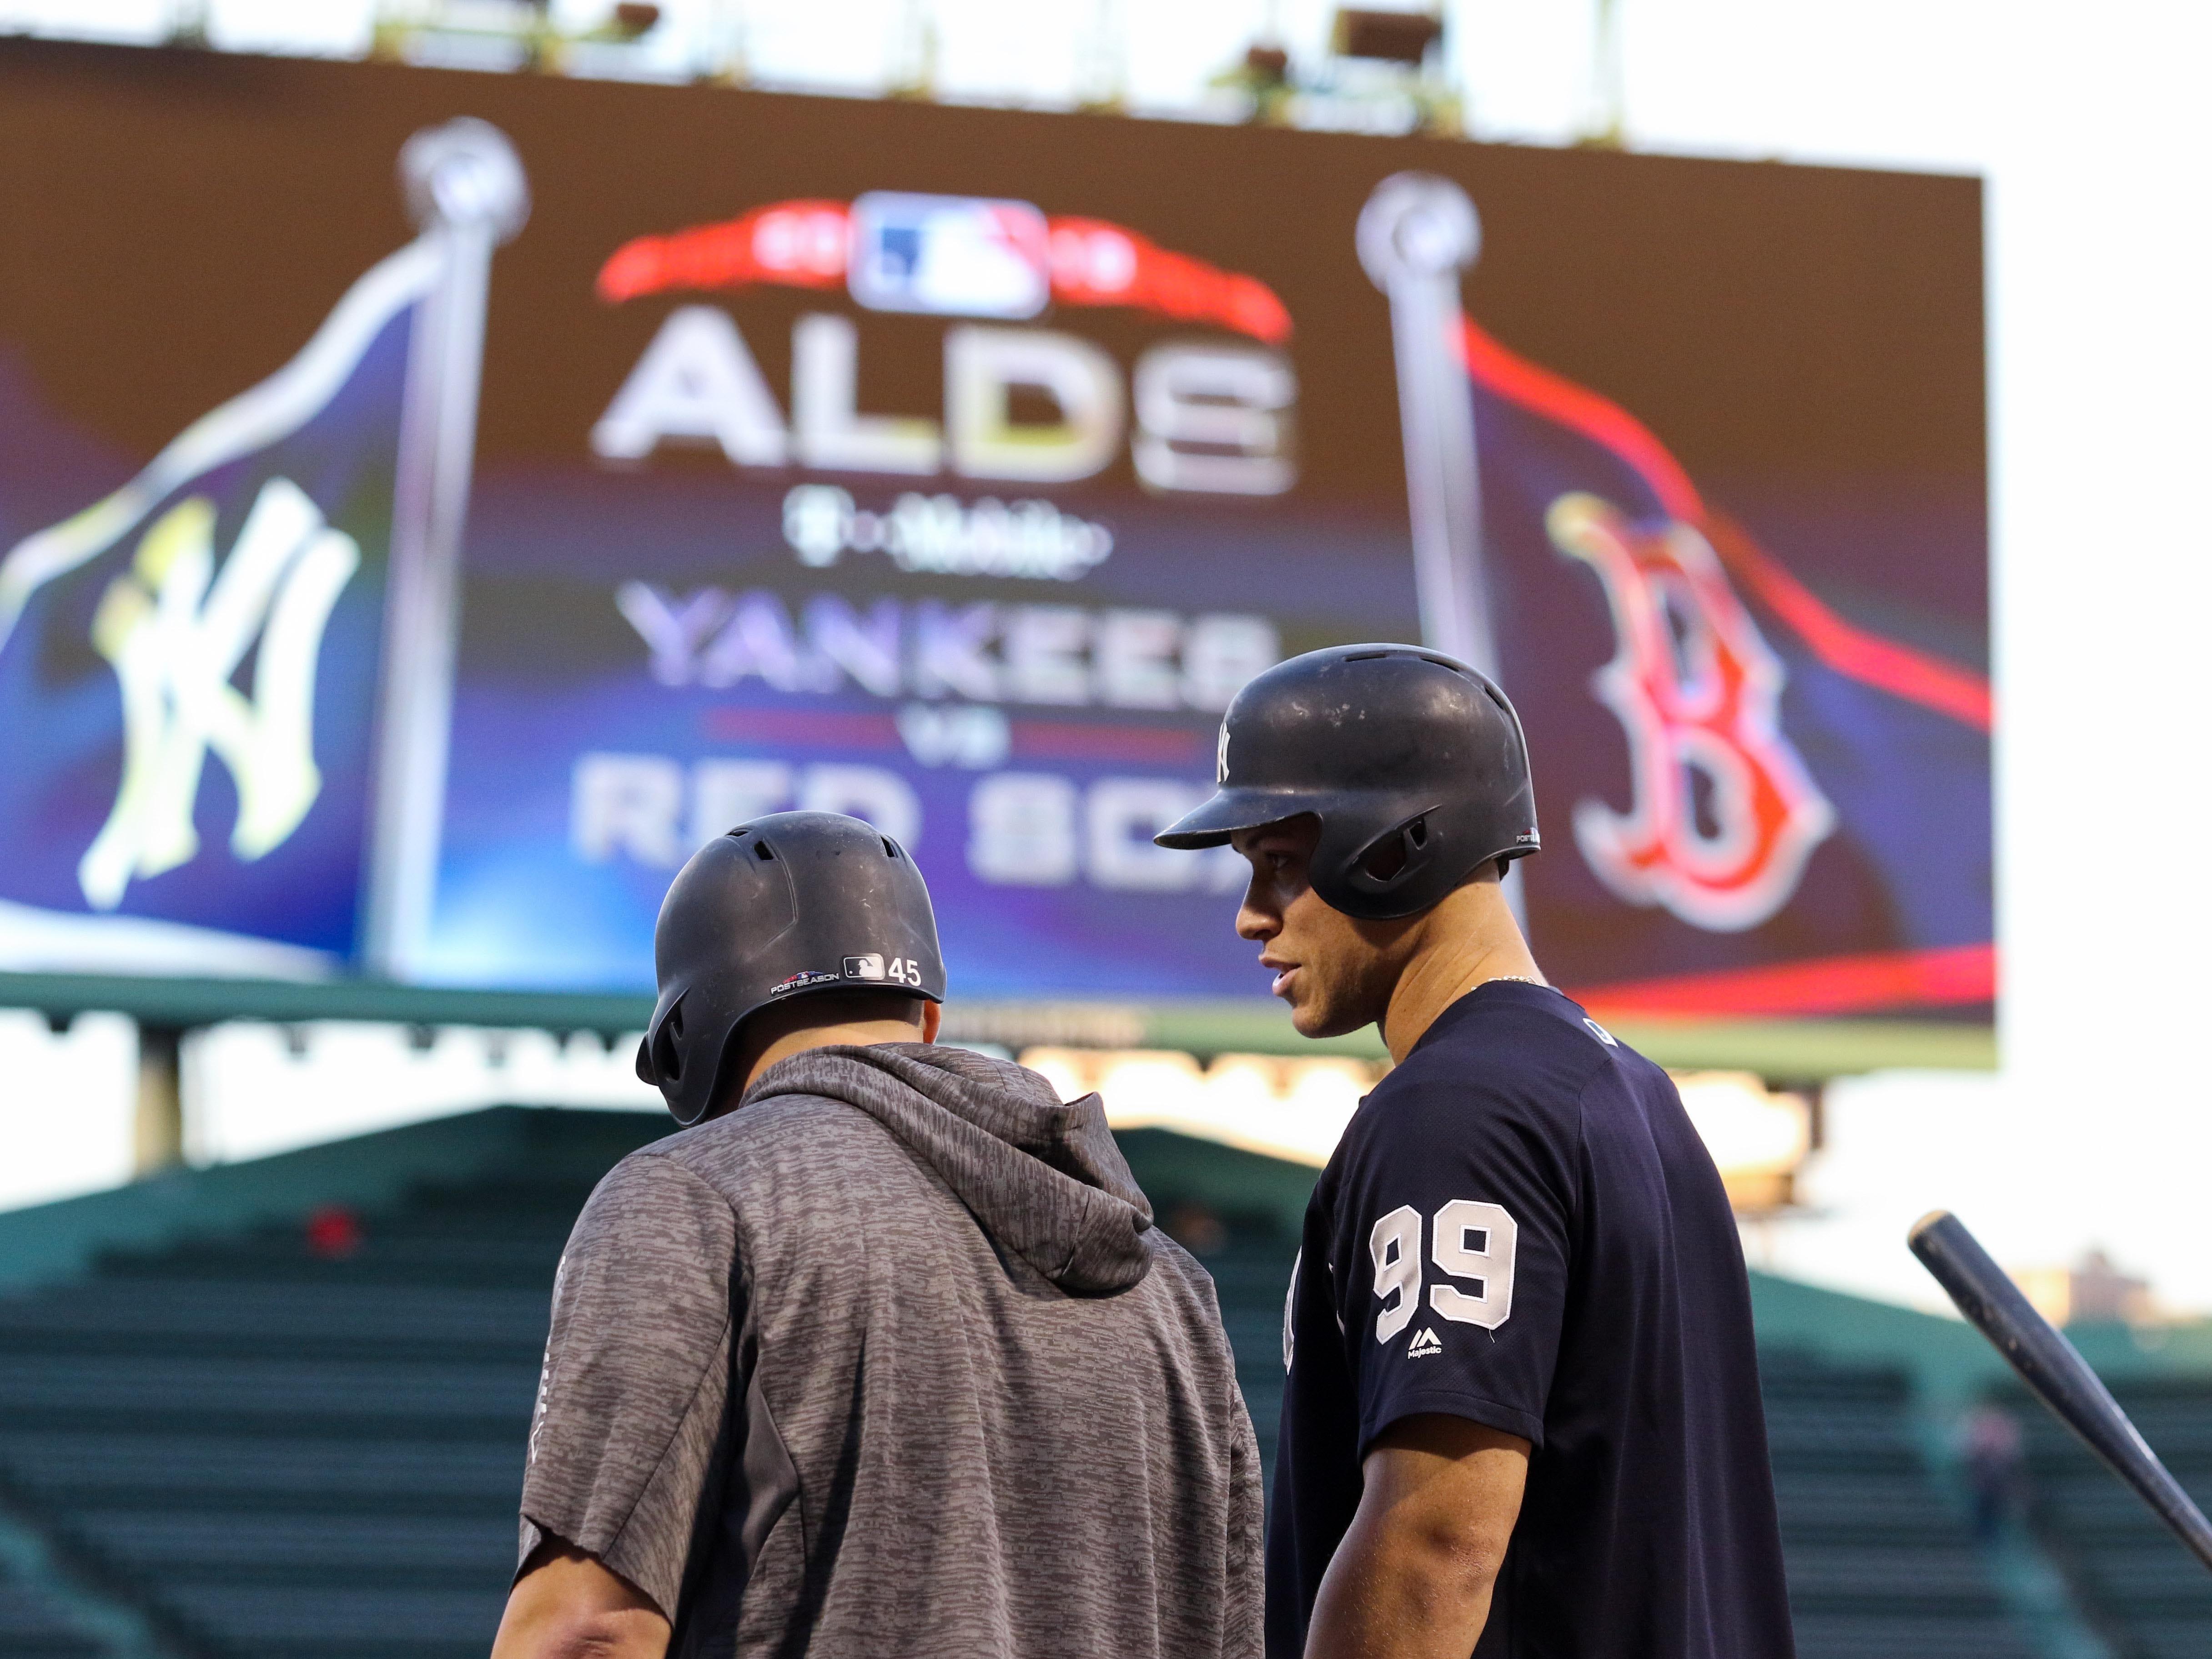 ALDS Game 1: Yankees right fielder Aaron Judge first baseman Luke Voit take batting practice.